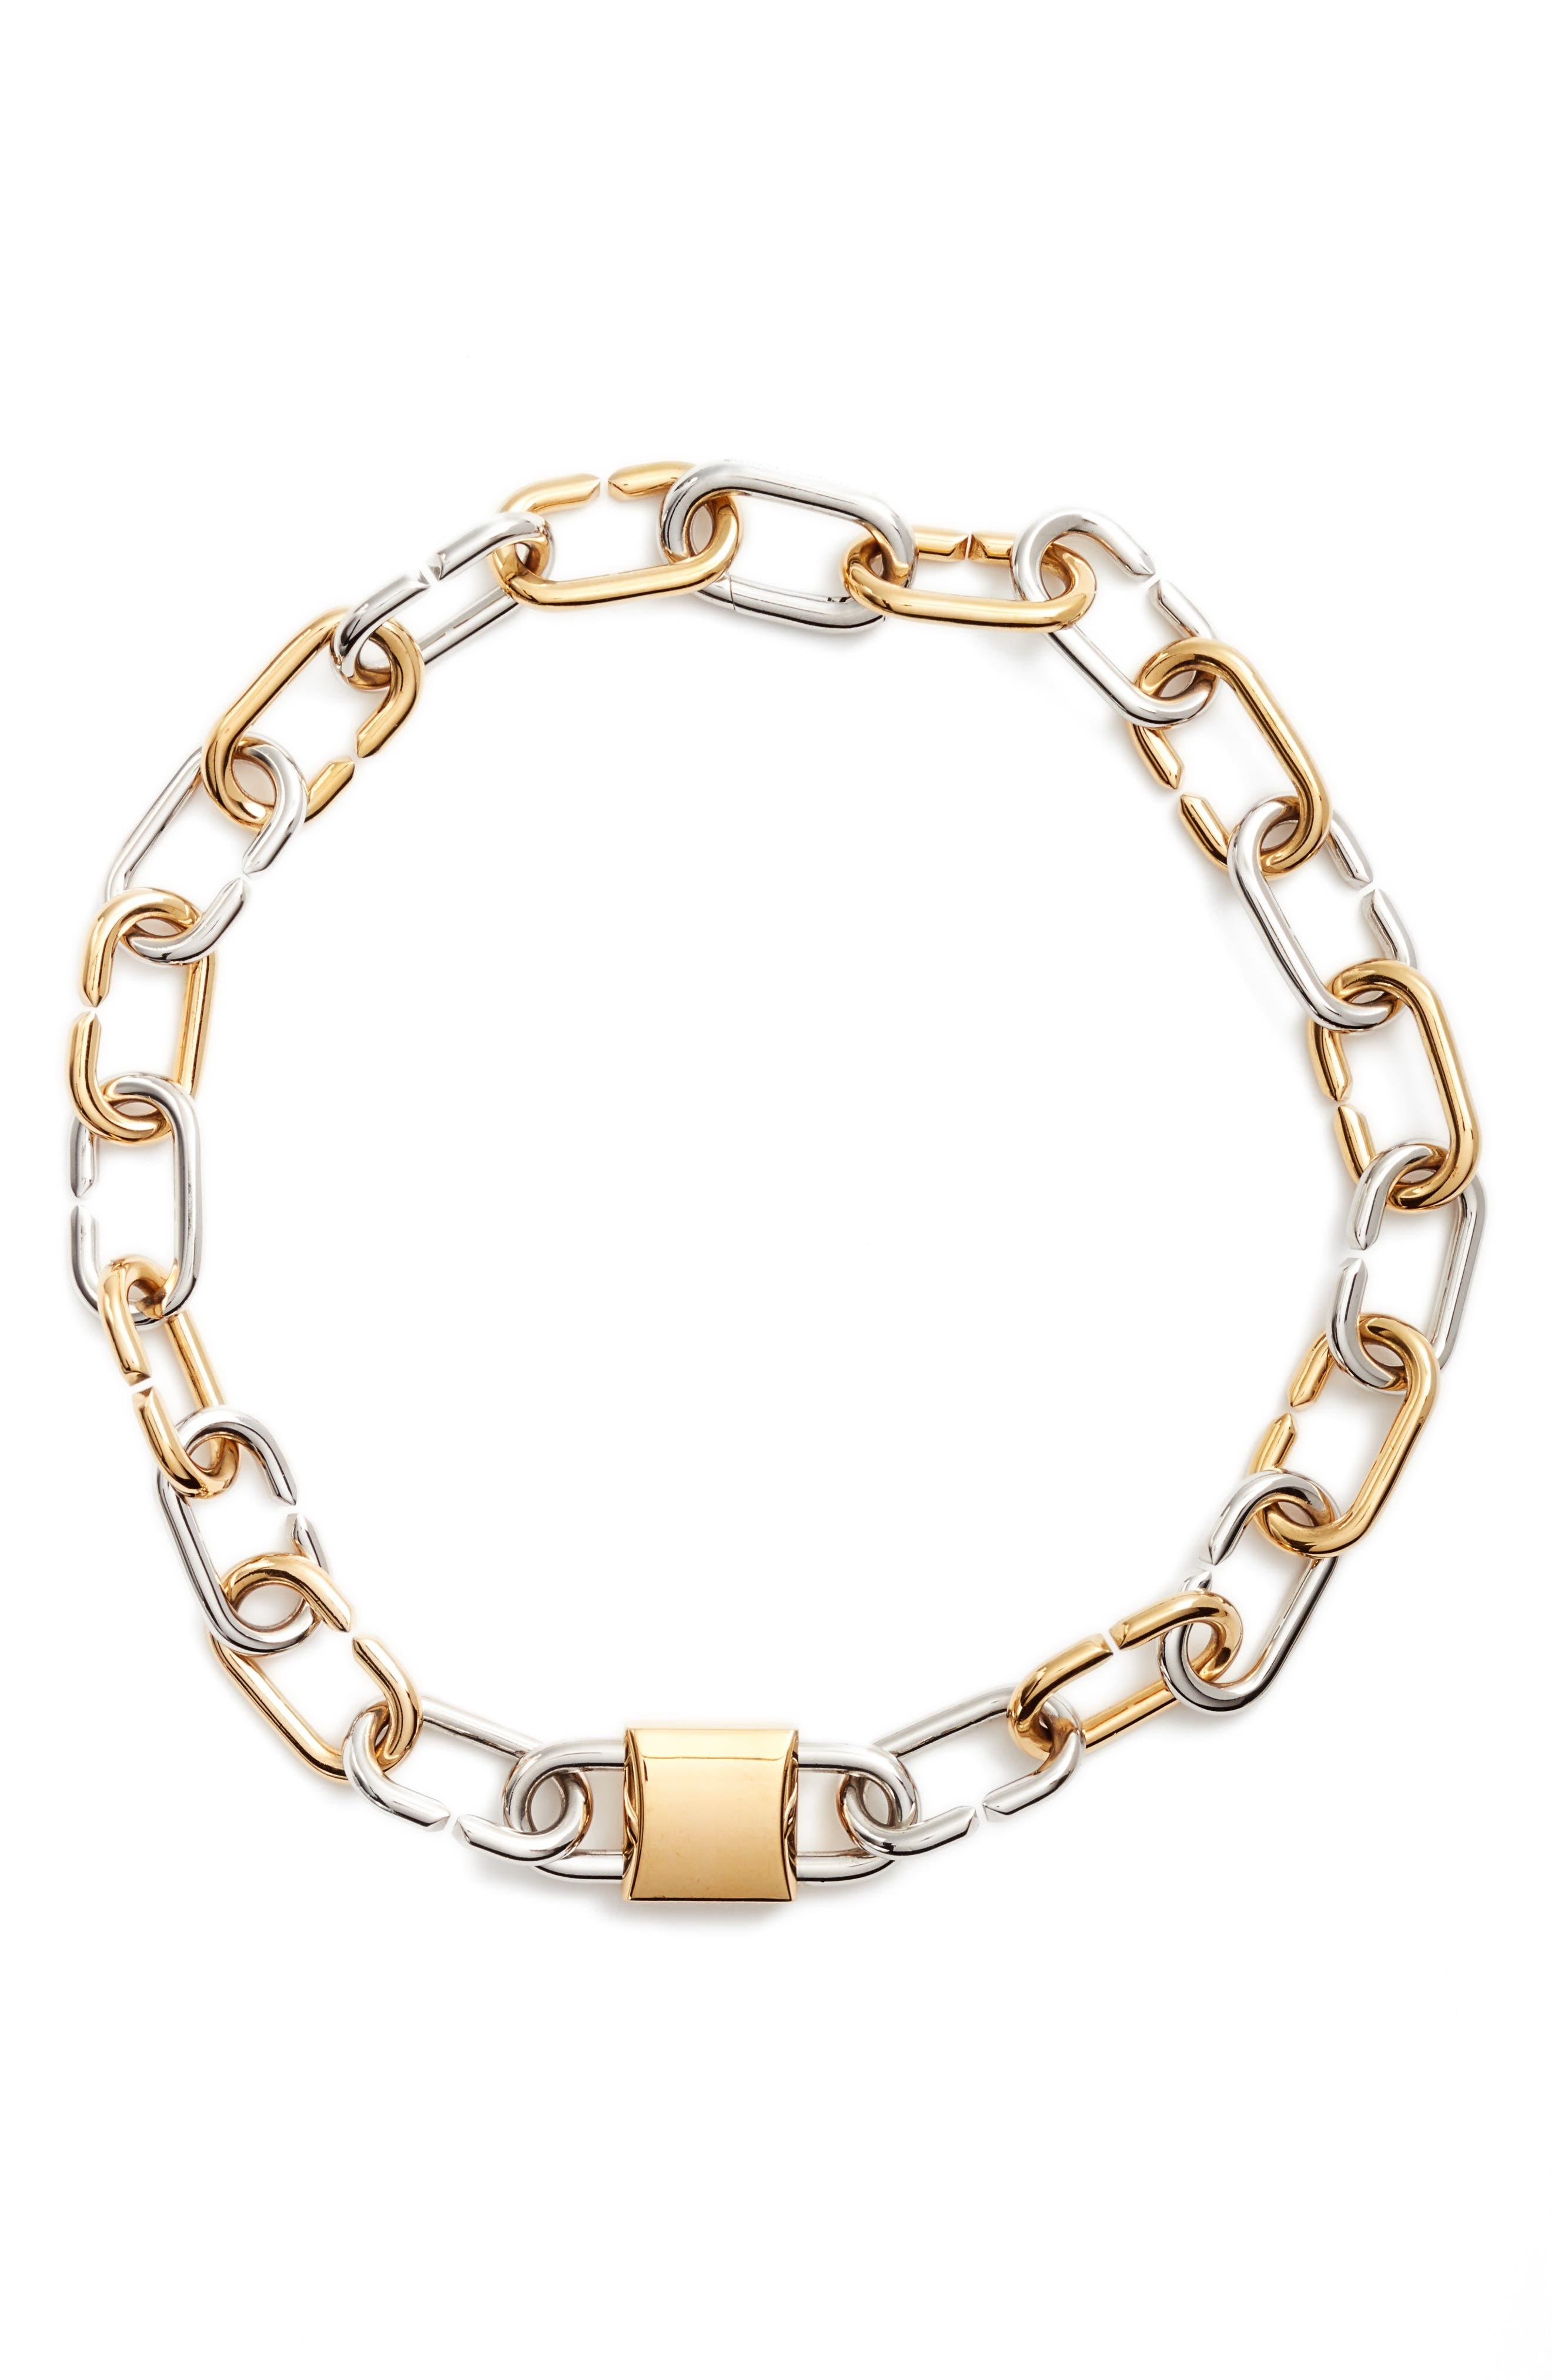 Alexander Wang Link Collar Necklace